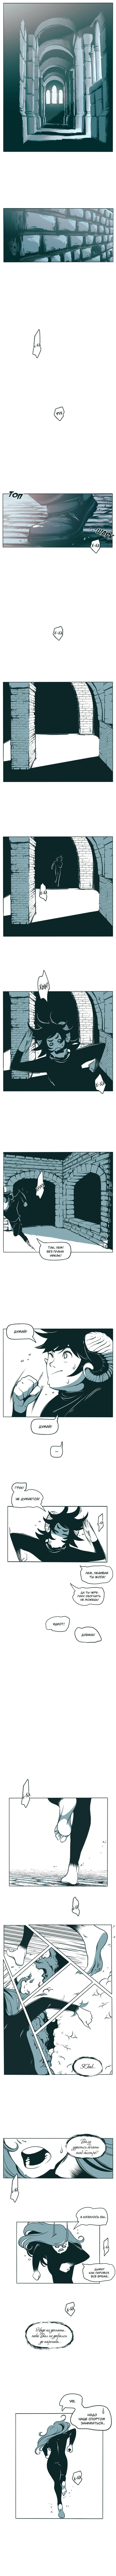 https://r1.ninemanga.com/comics/pic2/0/33536/420922/1534437753600.jpg Page 1